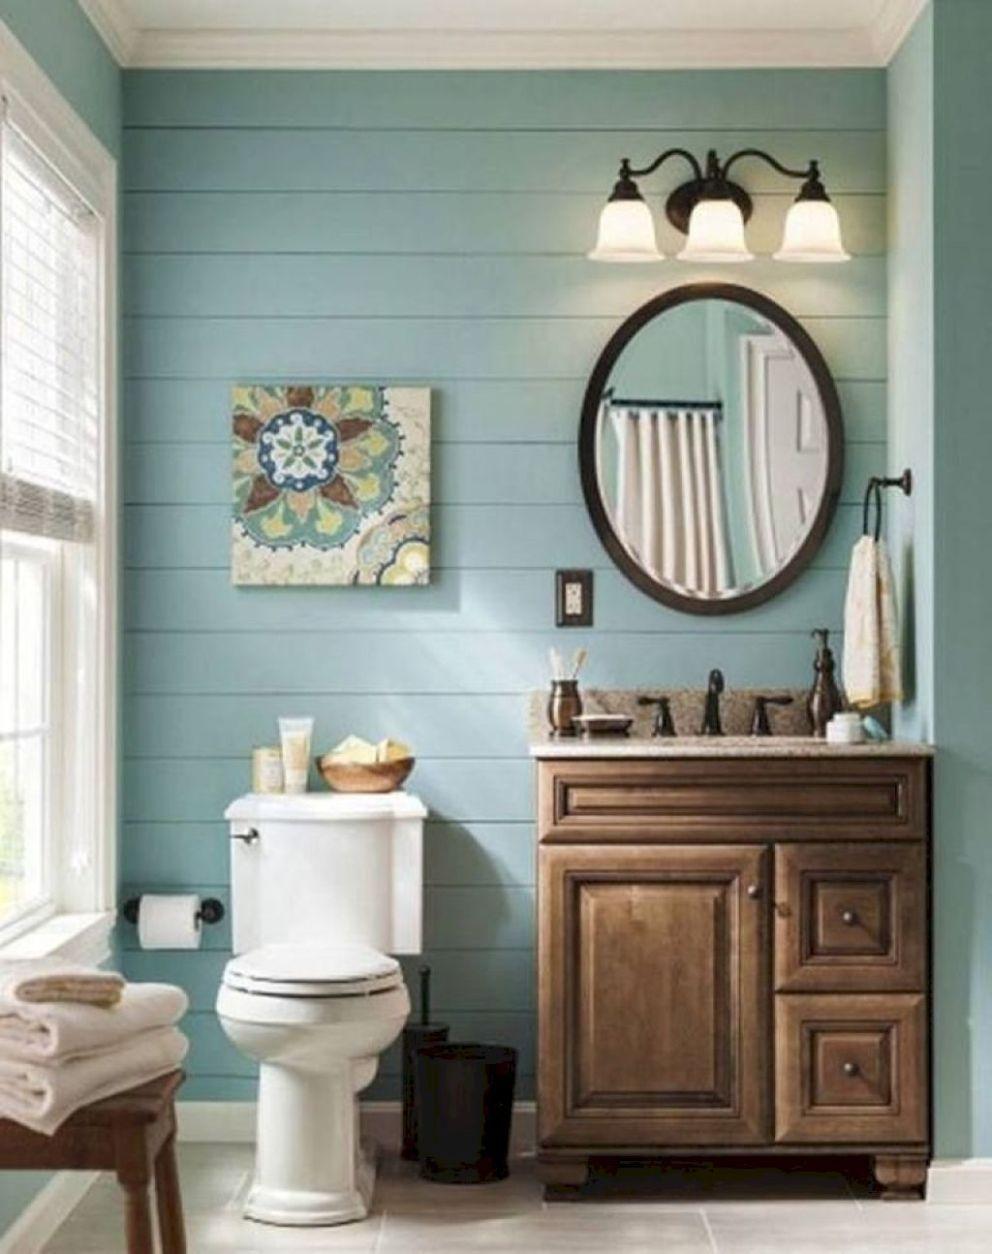 Rustikale badezimmerdekorideen small bathroom decor and design ideas   bathroom ideas  pinterest